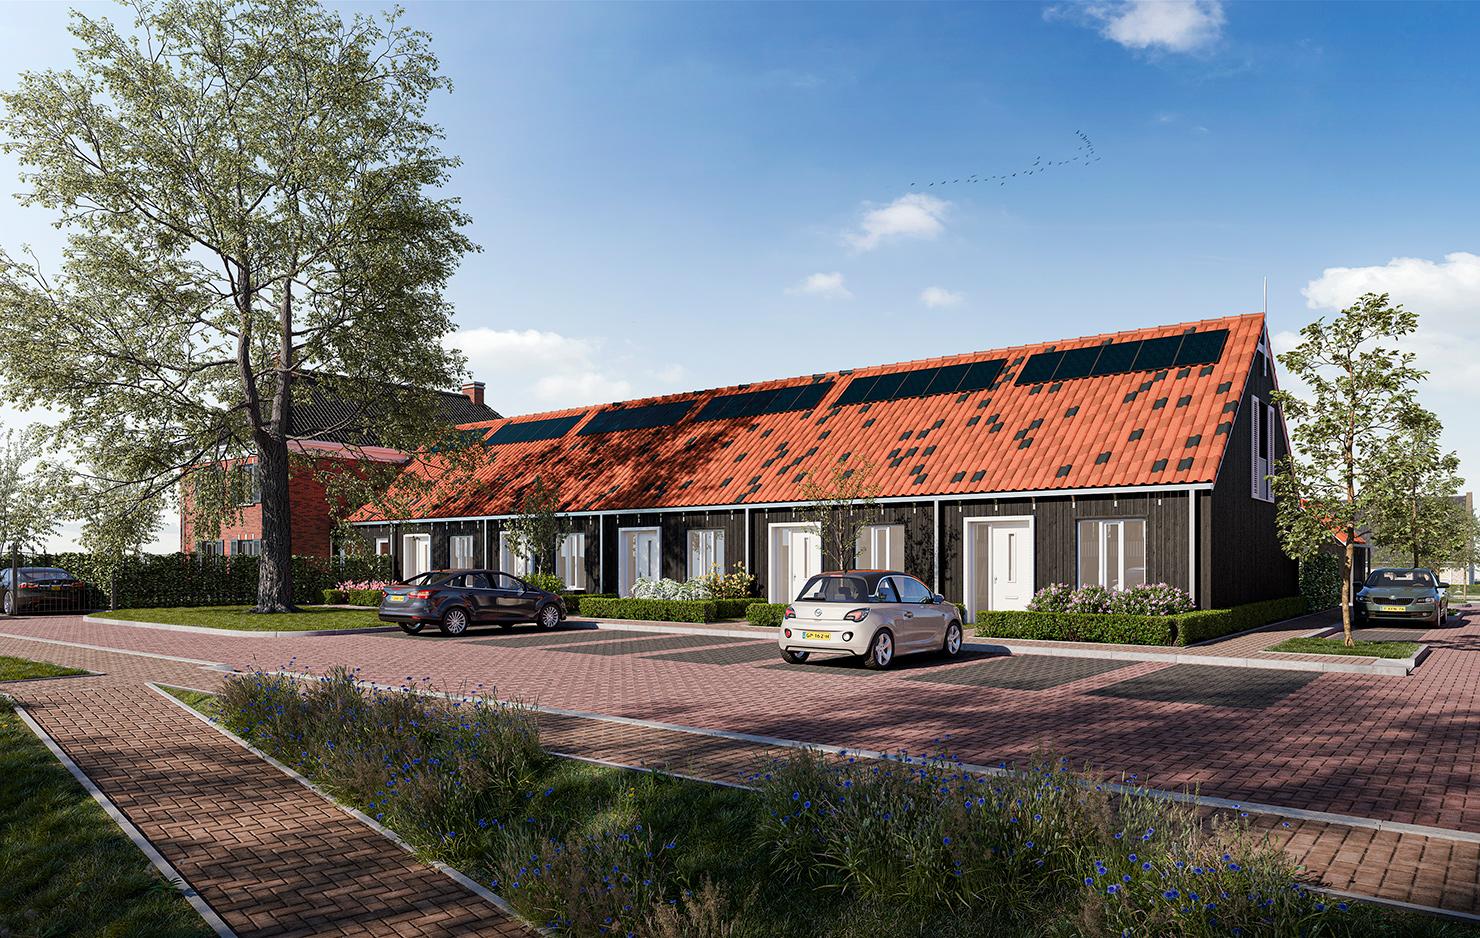 Waaranders in Het Noord Hollands Dagblad